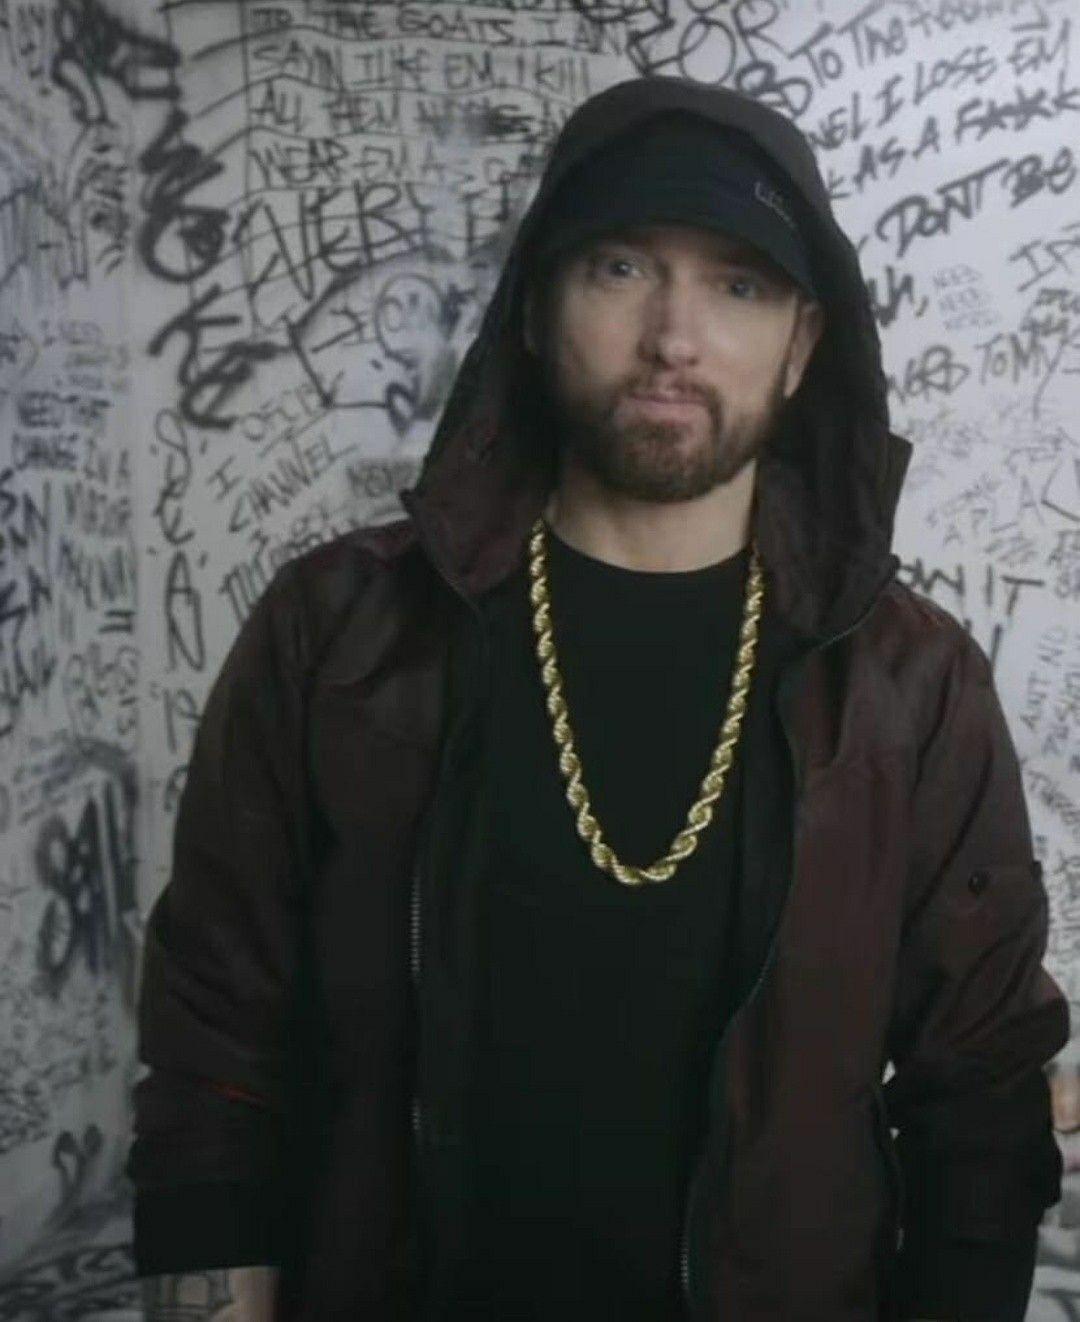 Pin By Jennifer Hall On Eye Candy In 2020 Eminem Rap Eminem Grammy Eminem Photos